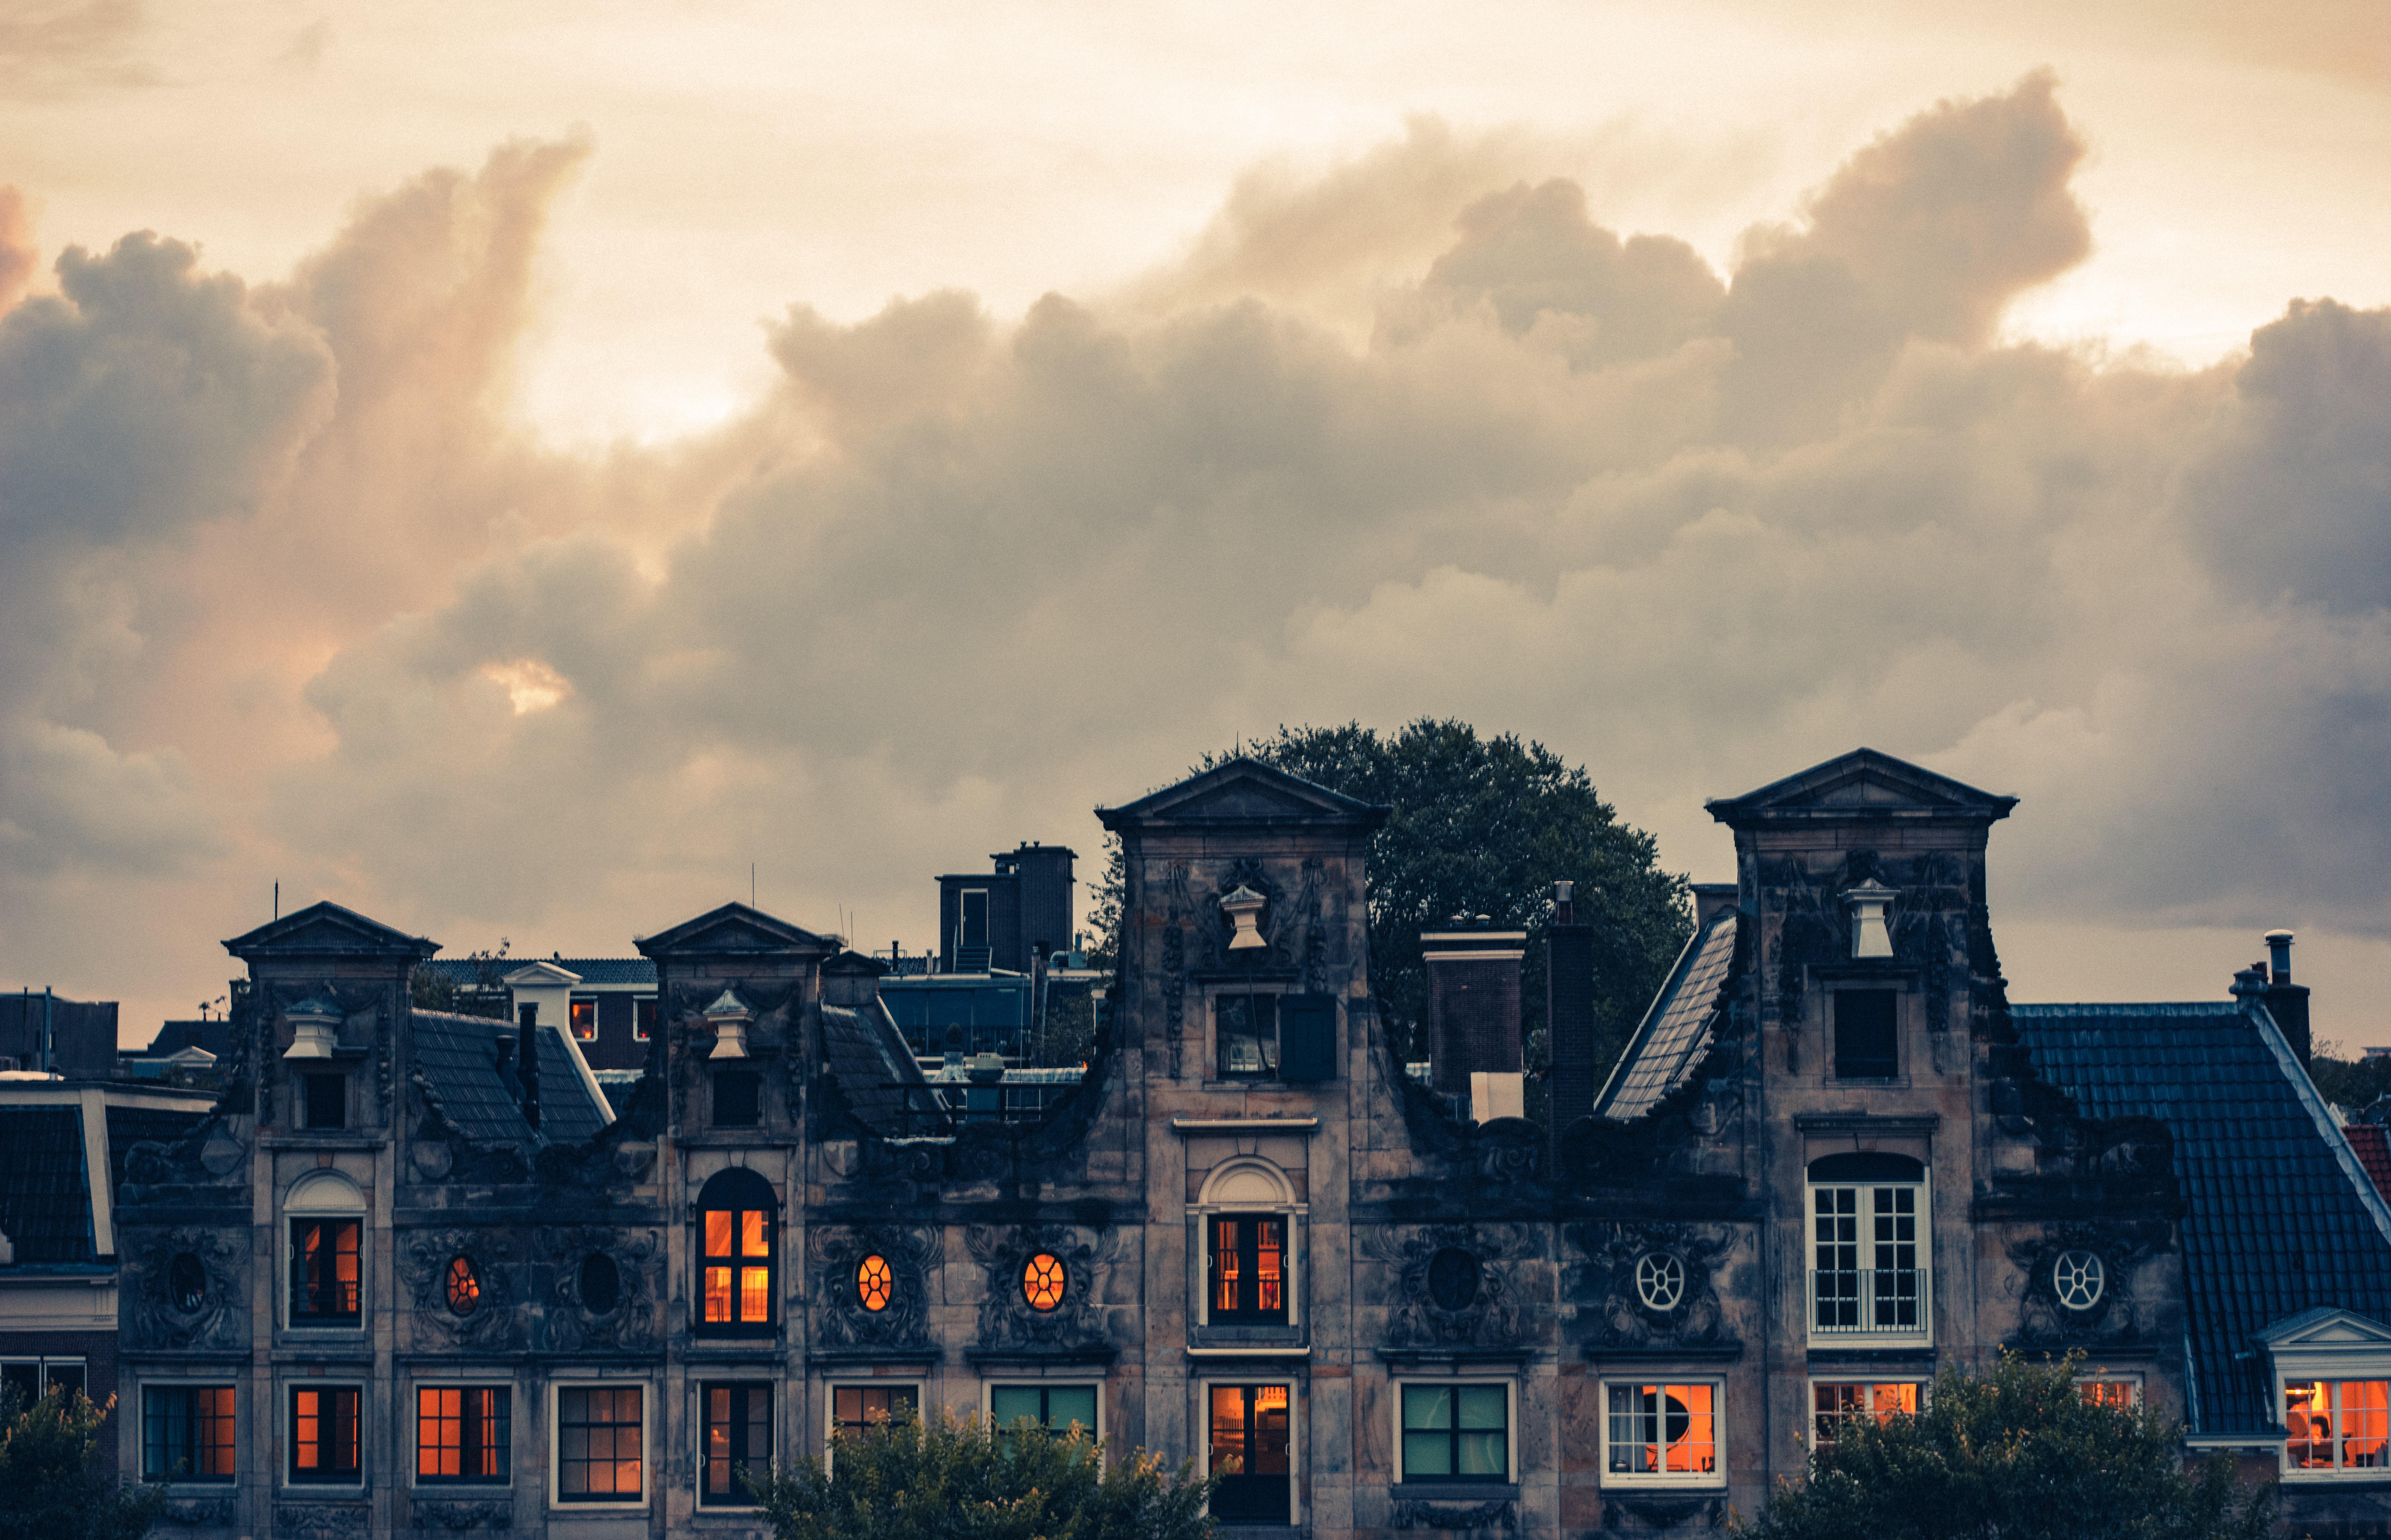 Europe, Experience, Halloween, Pumpkin, Festival, Spooky, Autumn, Travel, LocalBini, BiniBlog, Amsterdam, Netherlands